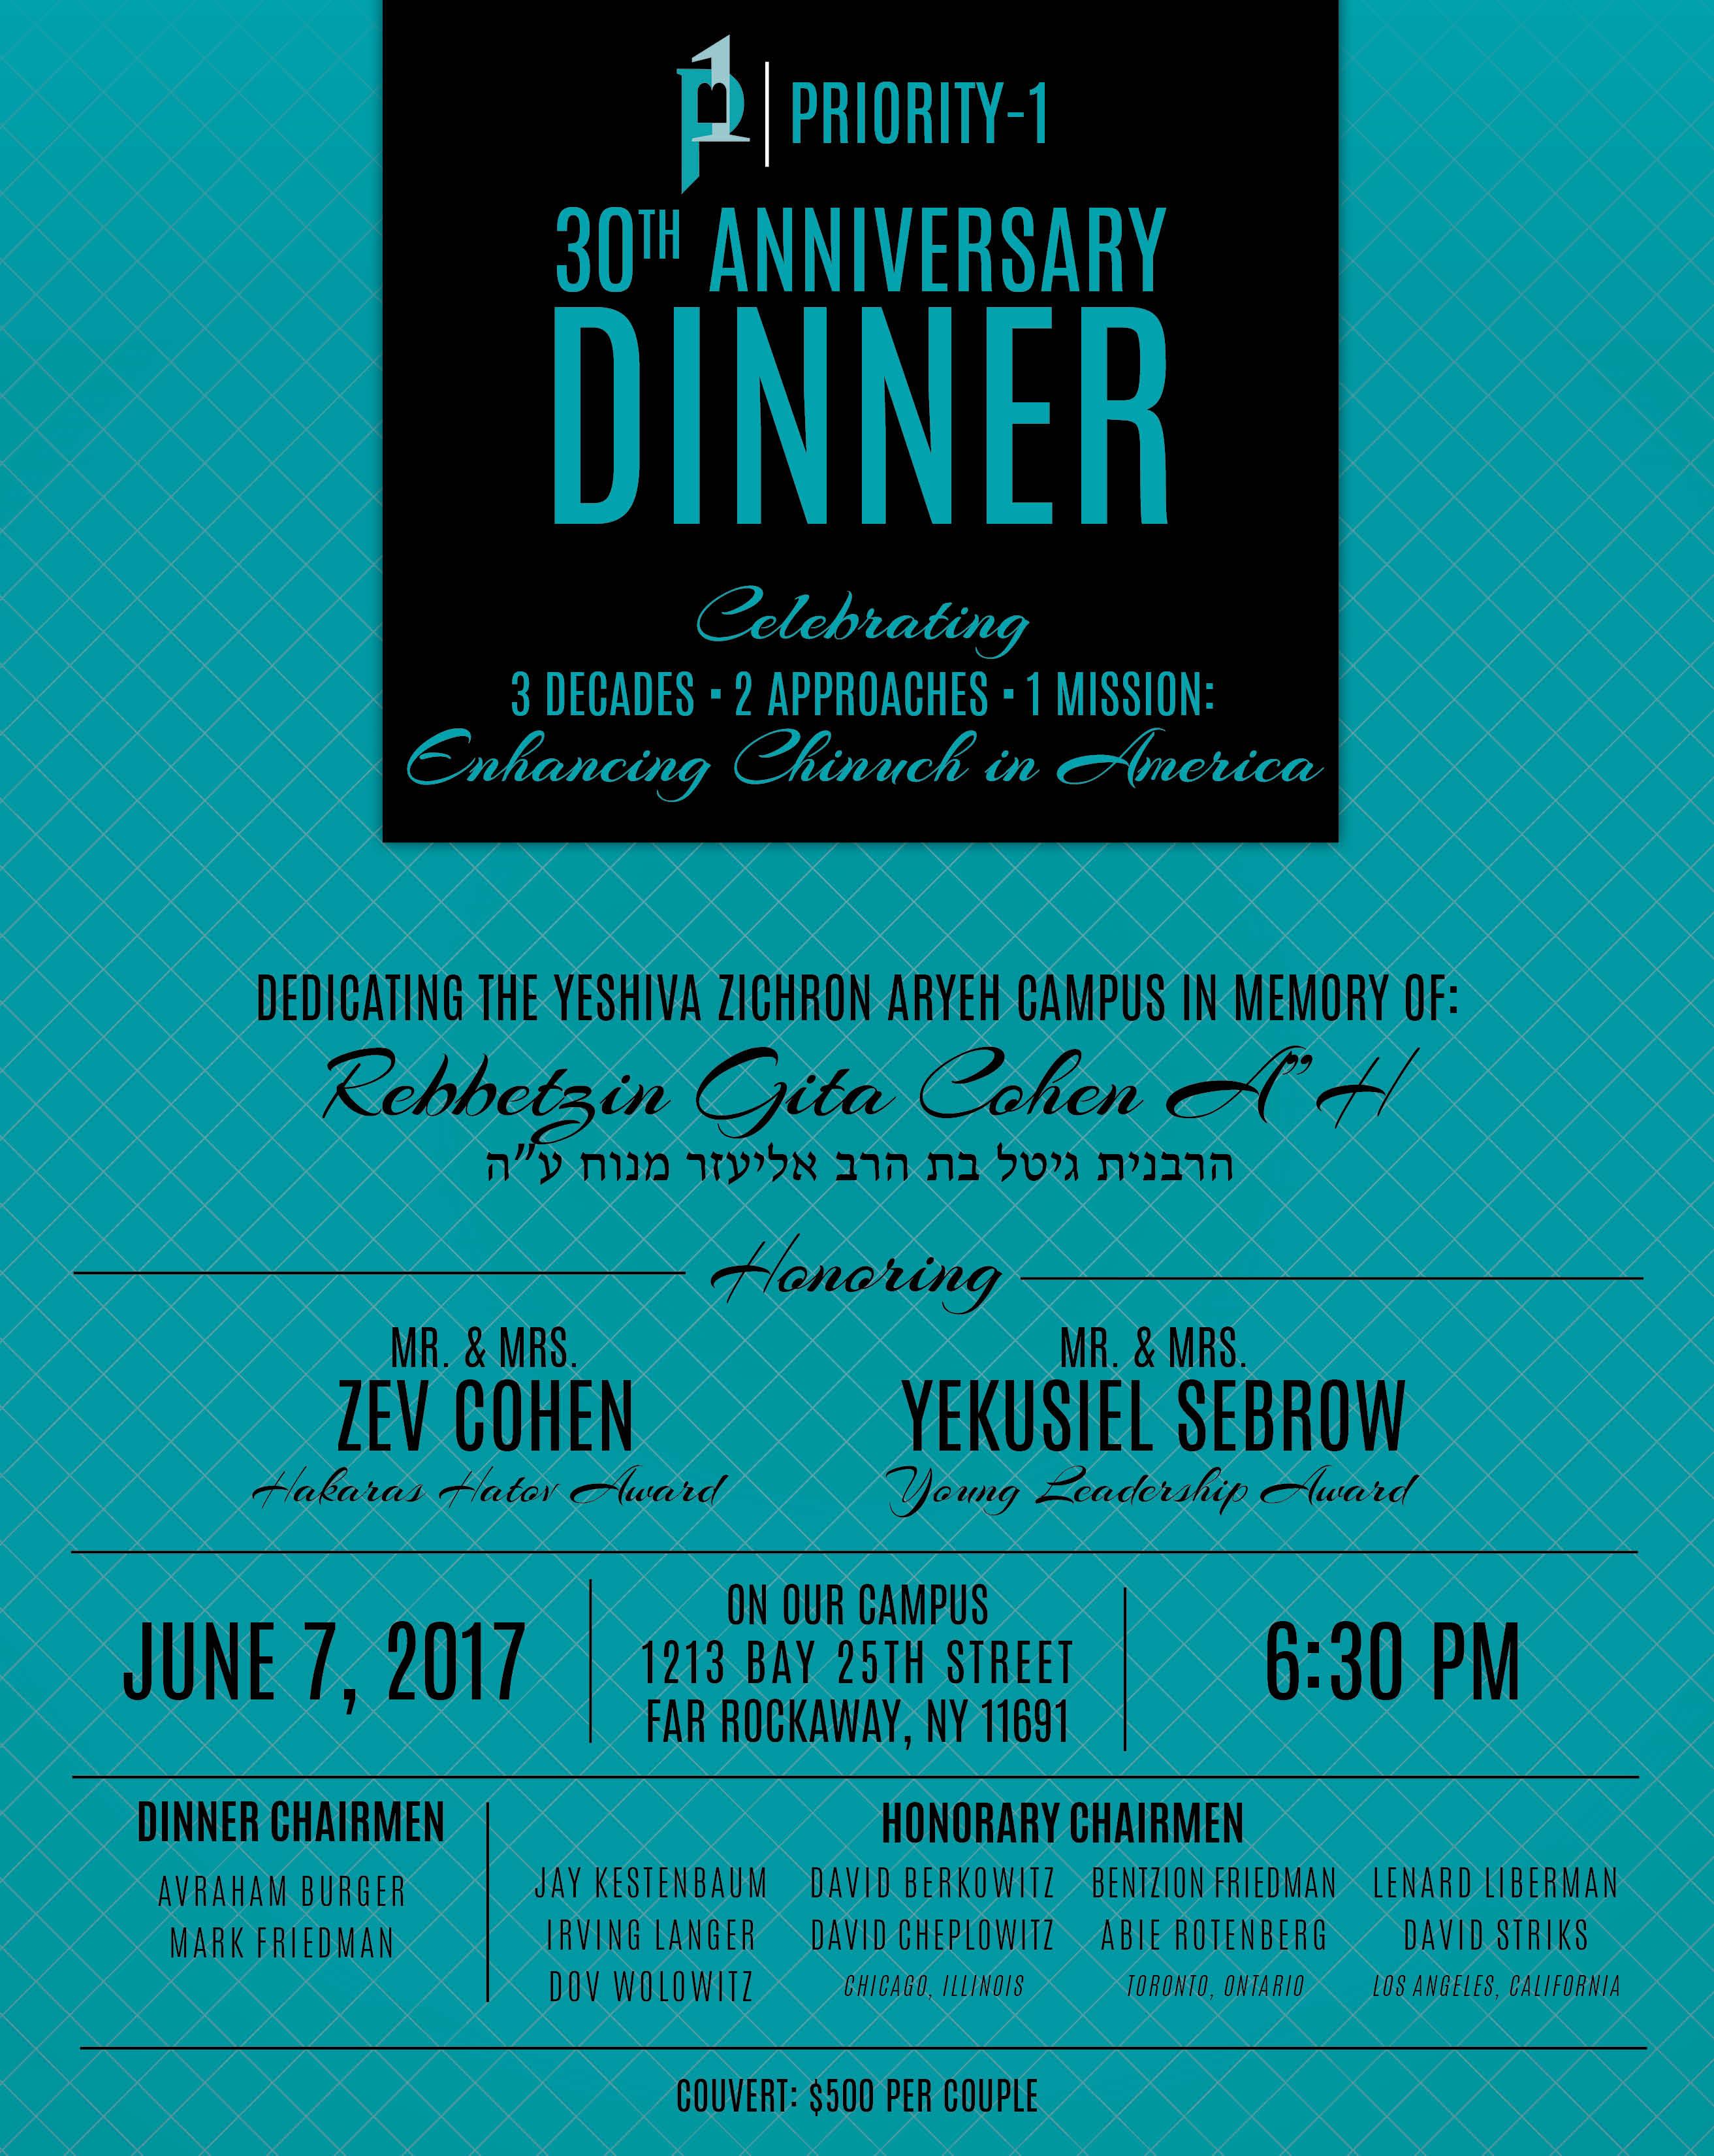 30th Anniversary Dinner